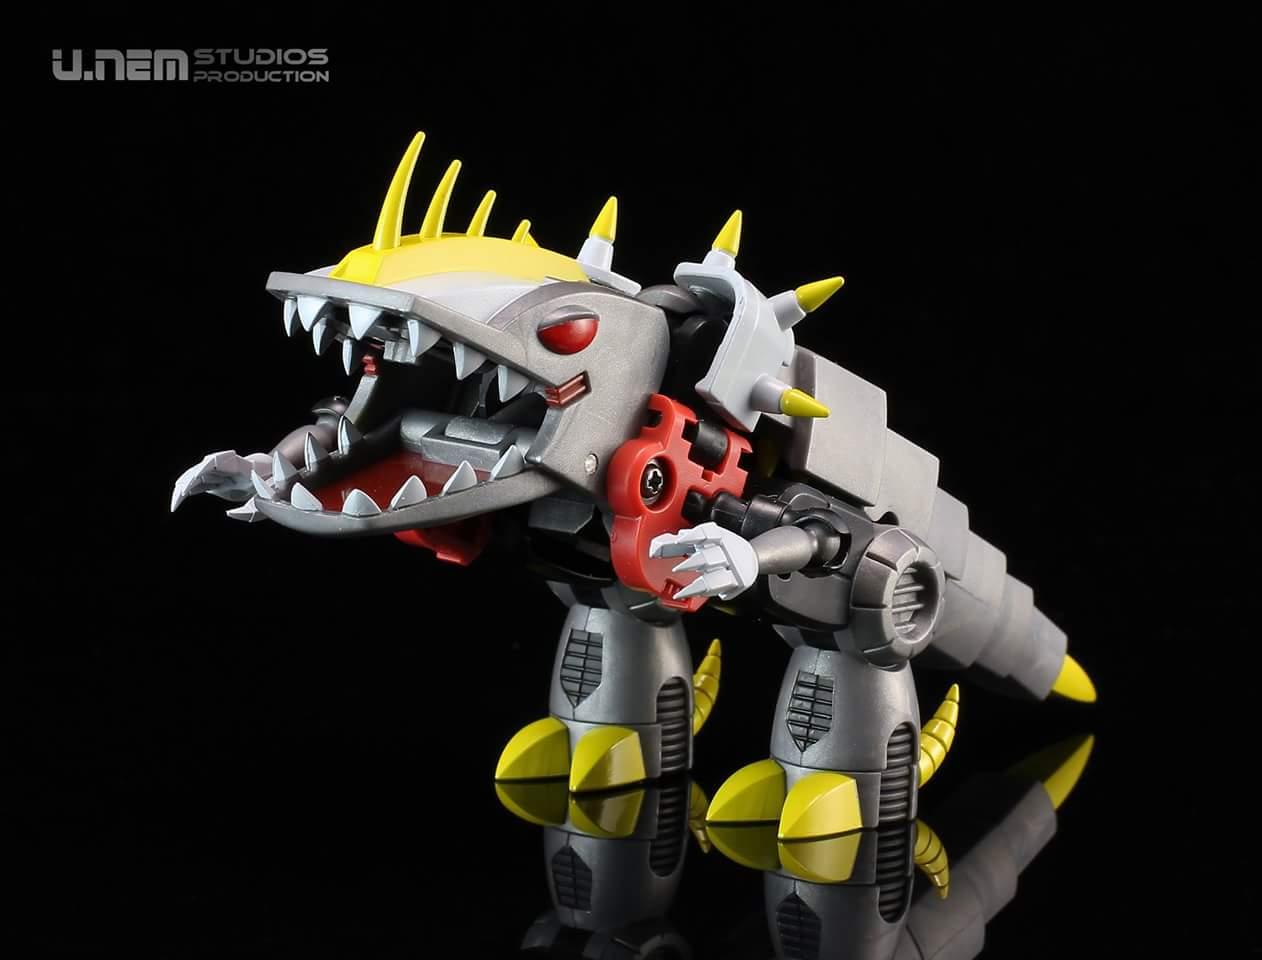 Produit Tiers: [Corbot V] CV-002 Mugger - aka Allicon | [Unique Toys] G-02 Sharky - aka Sharkticon/Requanicon W8YMb0pM